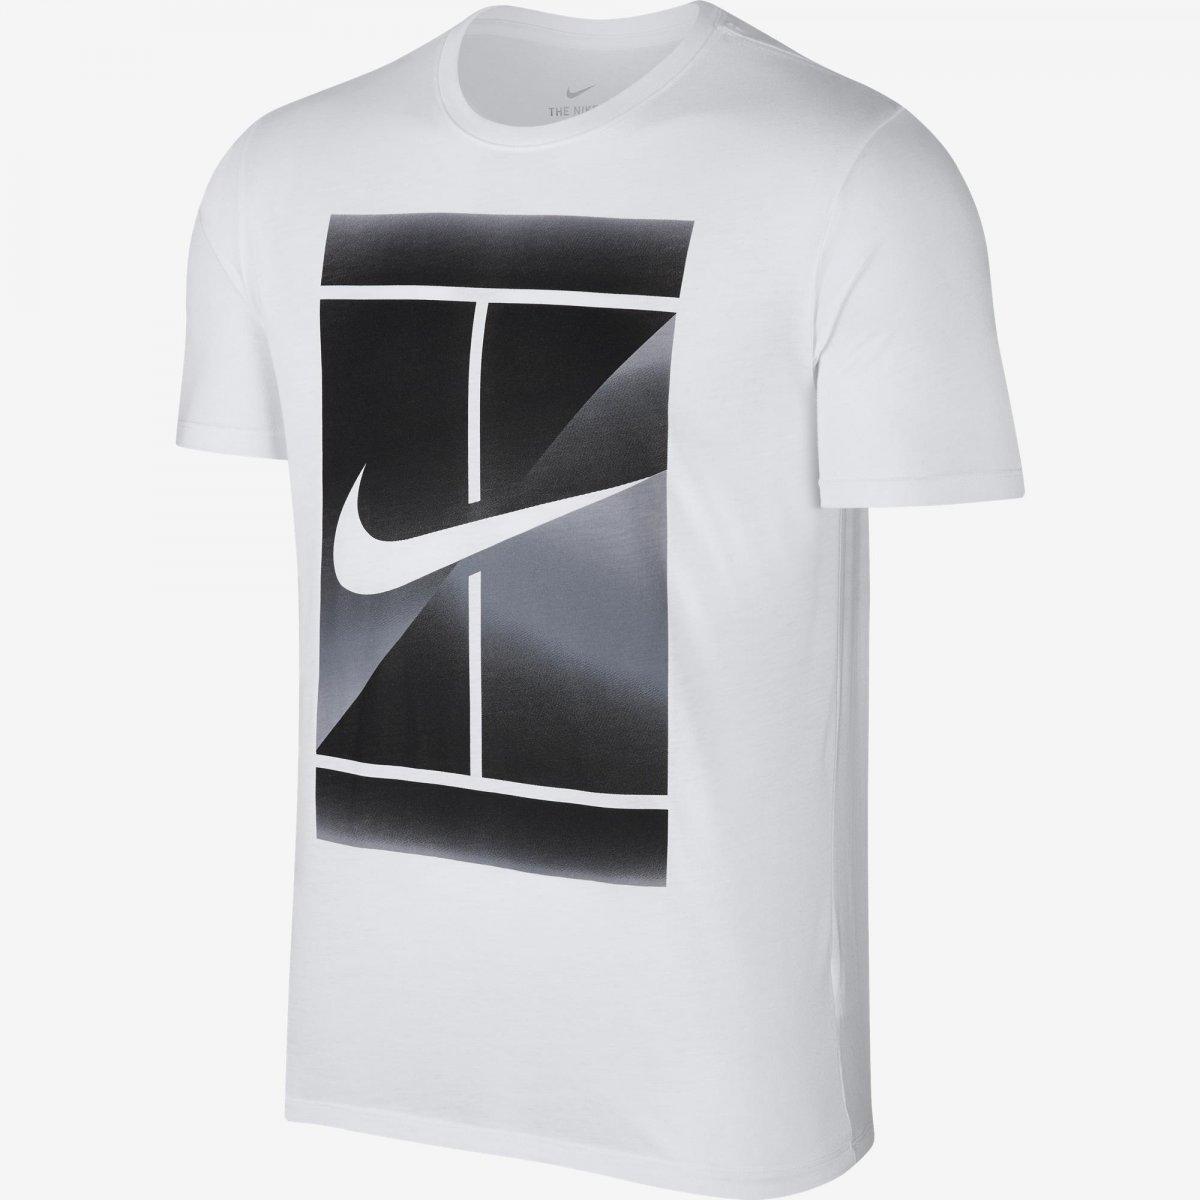 d8016215e Passe o mouse na imagem para ampliar Ampliar imagem. Camiseta Masculina ...